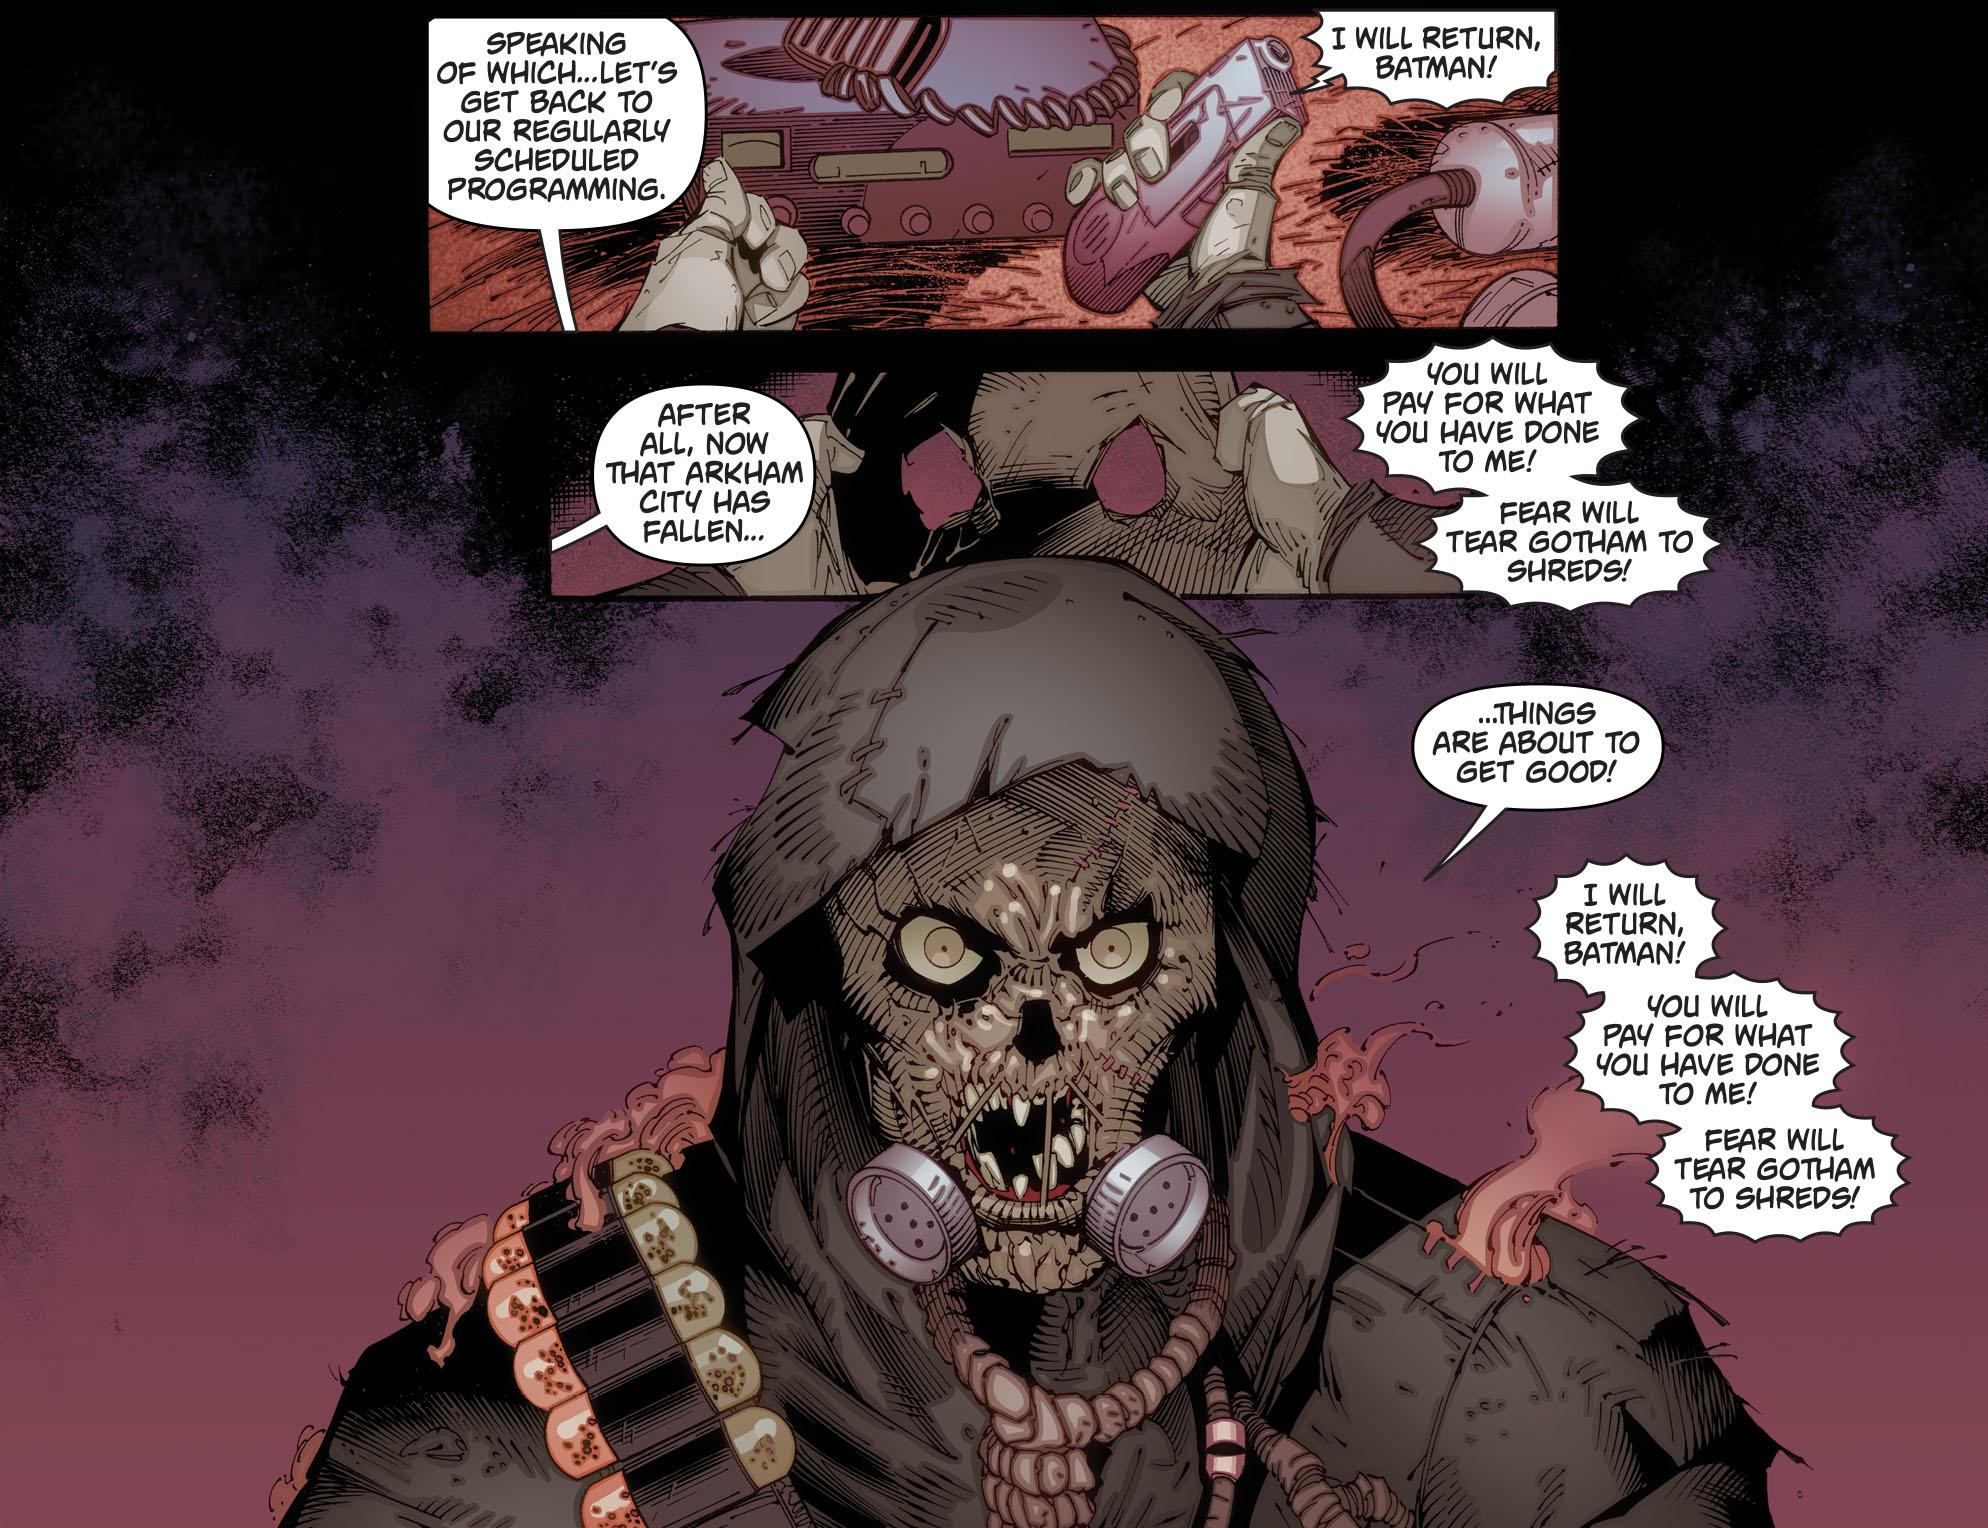 Batman Arkham Knight Jokers Son at Batman Arkham Knight